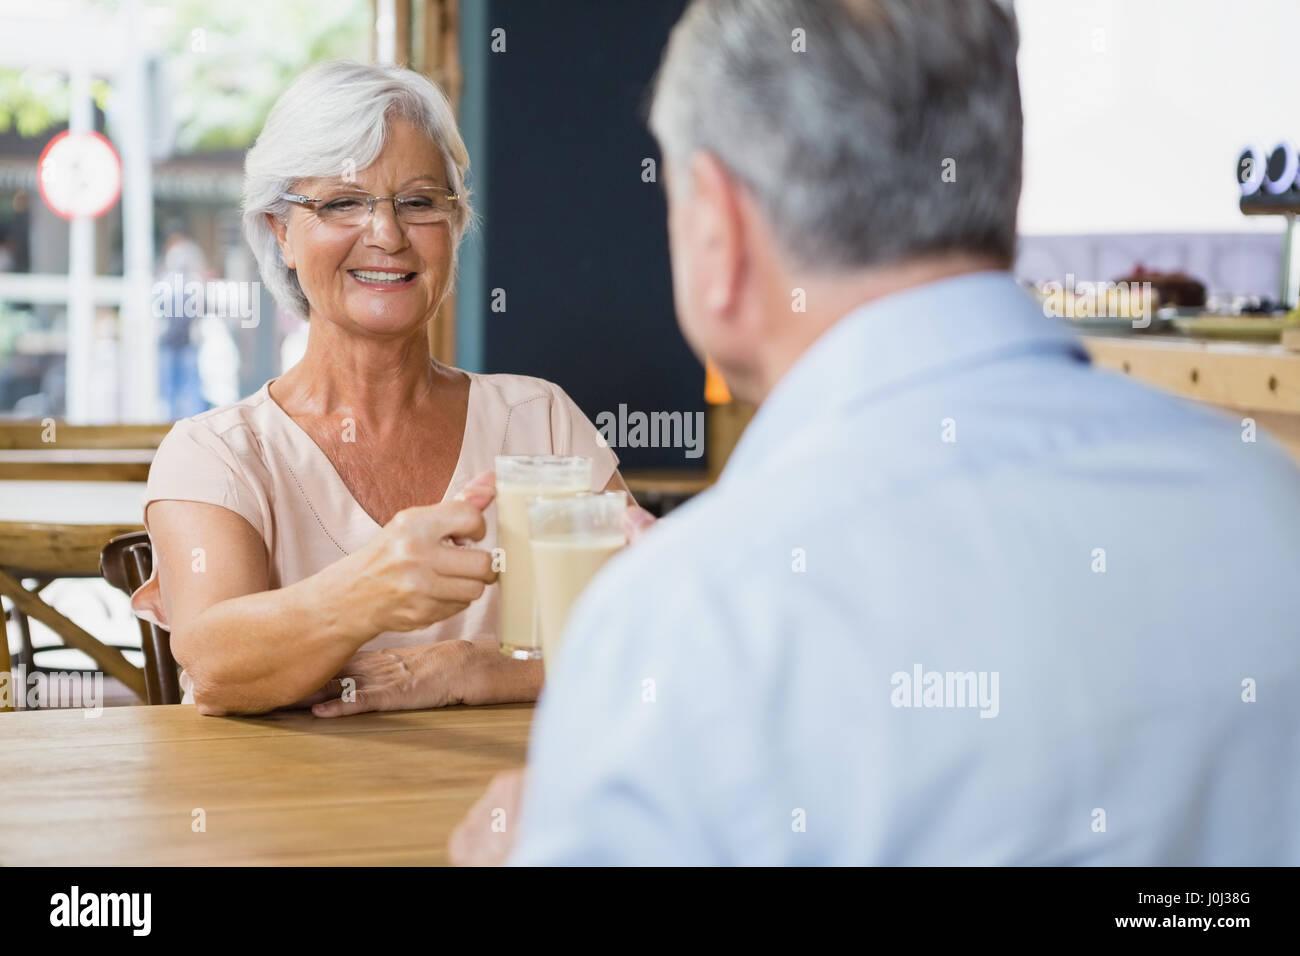 Senior couple toasting verres de café froid dans café Photo Stock